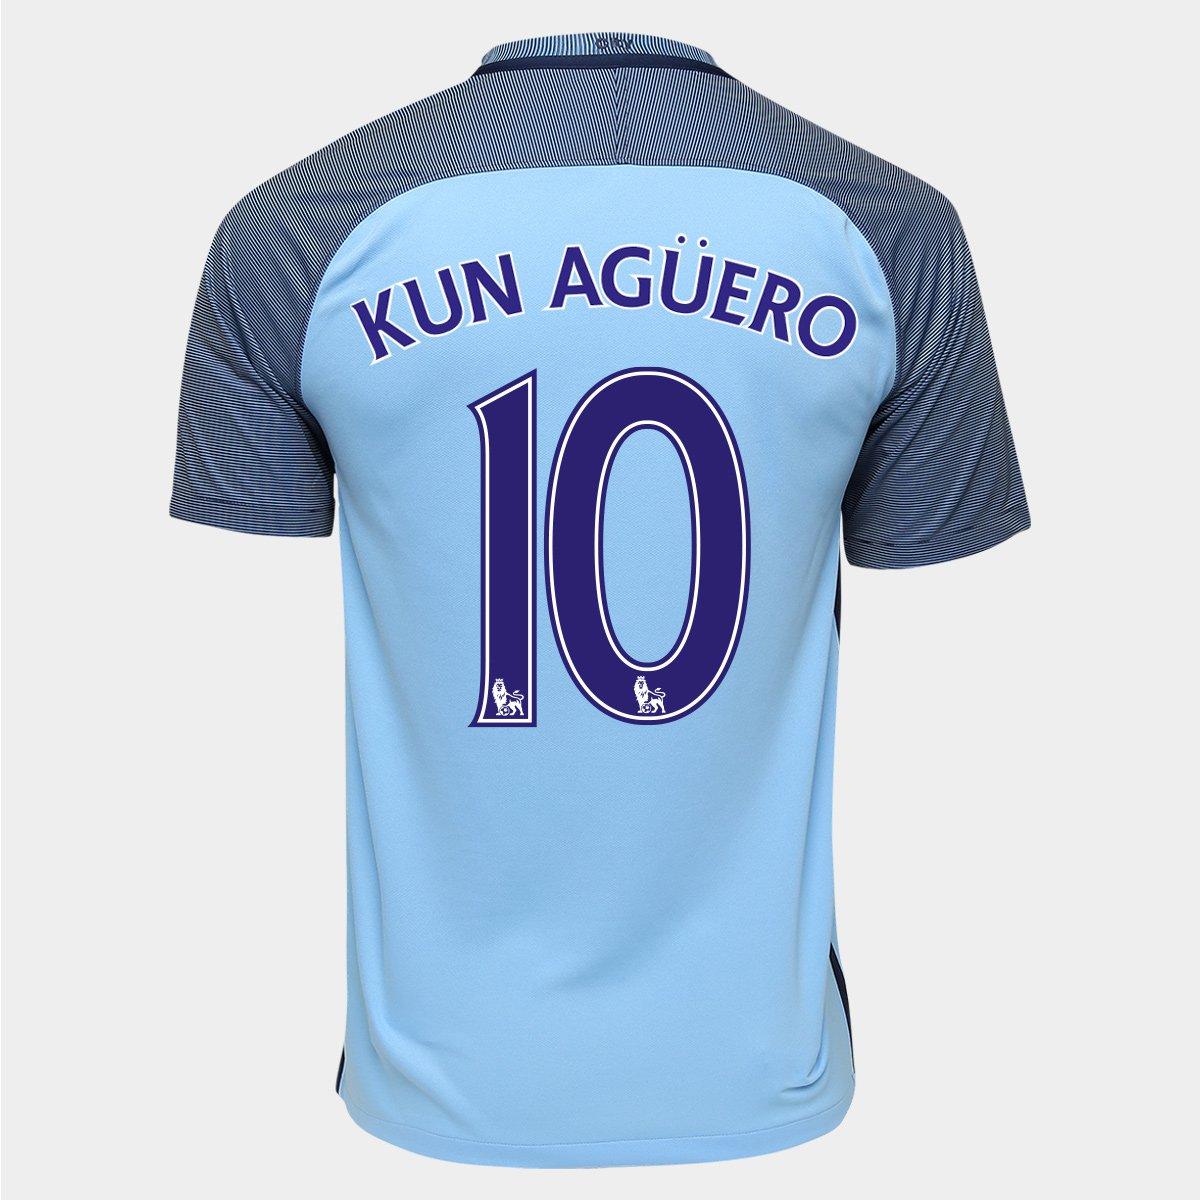 55fda8b623 Camisa Nike Manchester City Home 16 17 n° 10 - Kun Agüero - Compre Agora